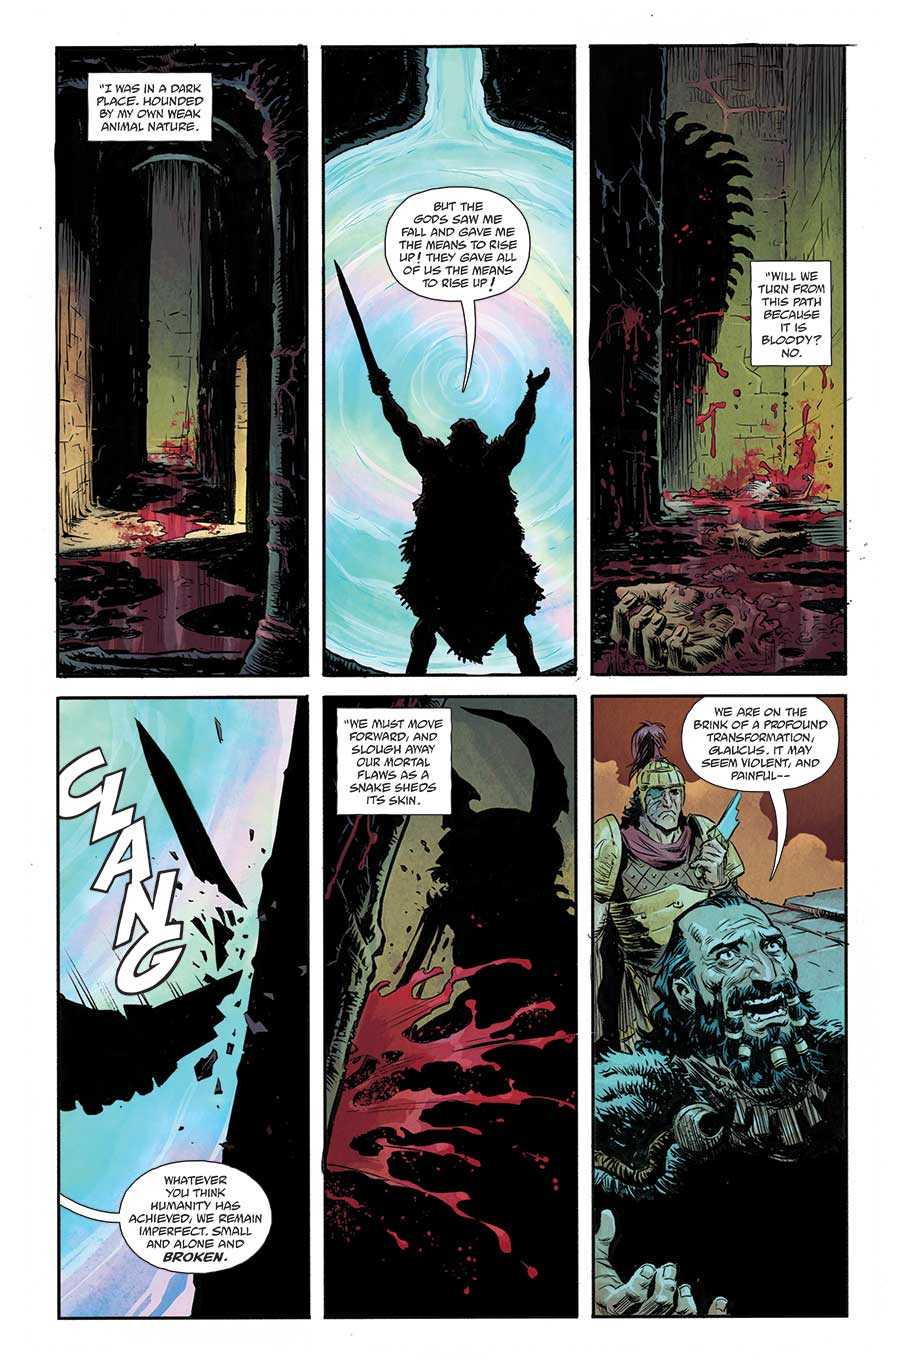 myth003-page-3